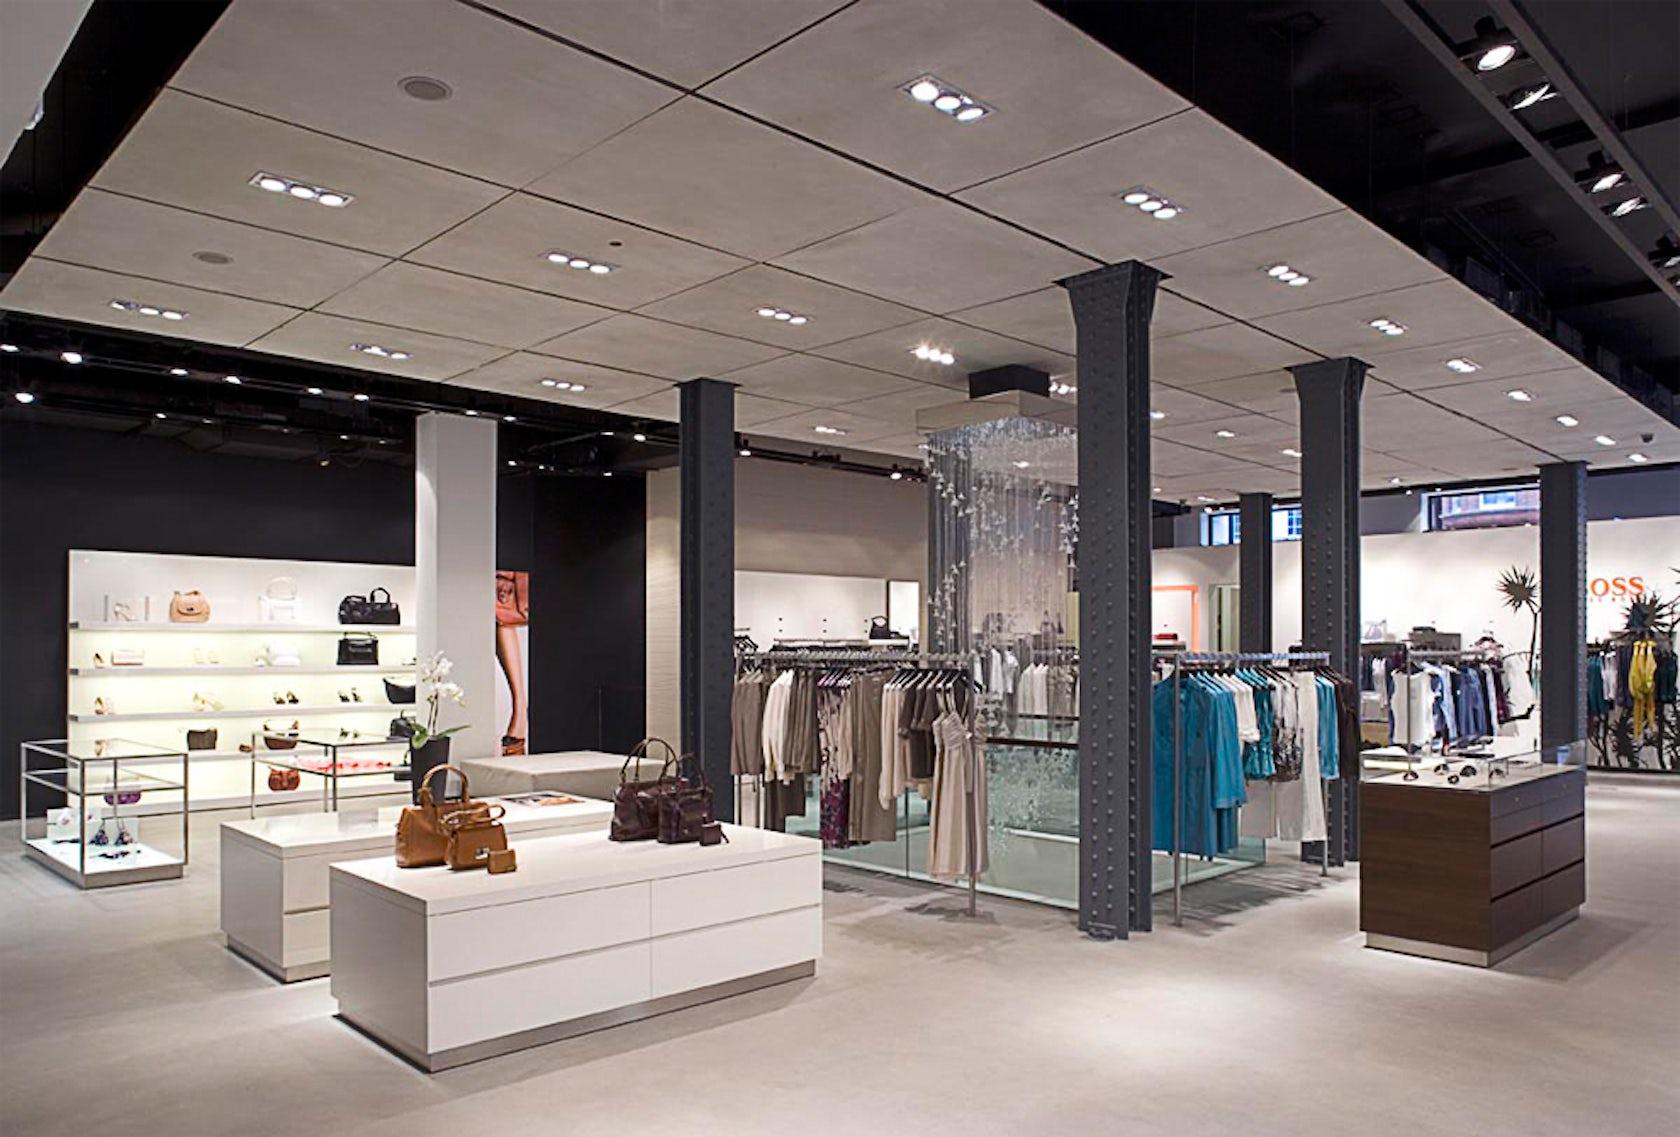 Hugo boss london flagship store architizer for Interior design agency edinburgh